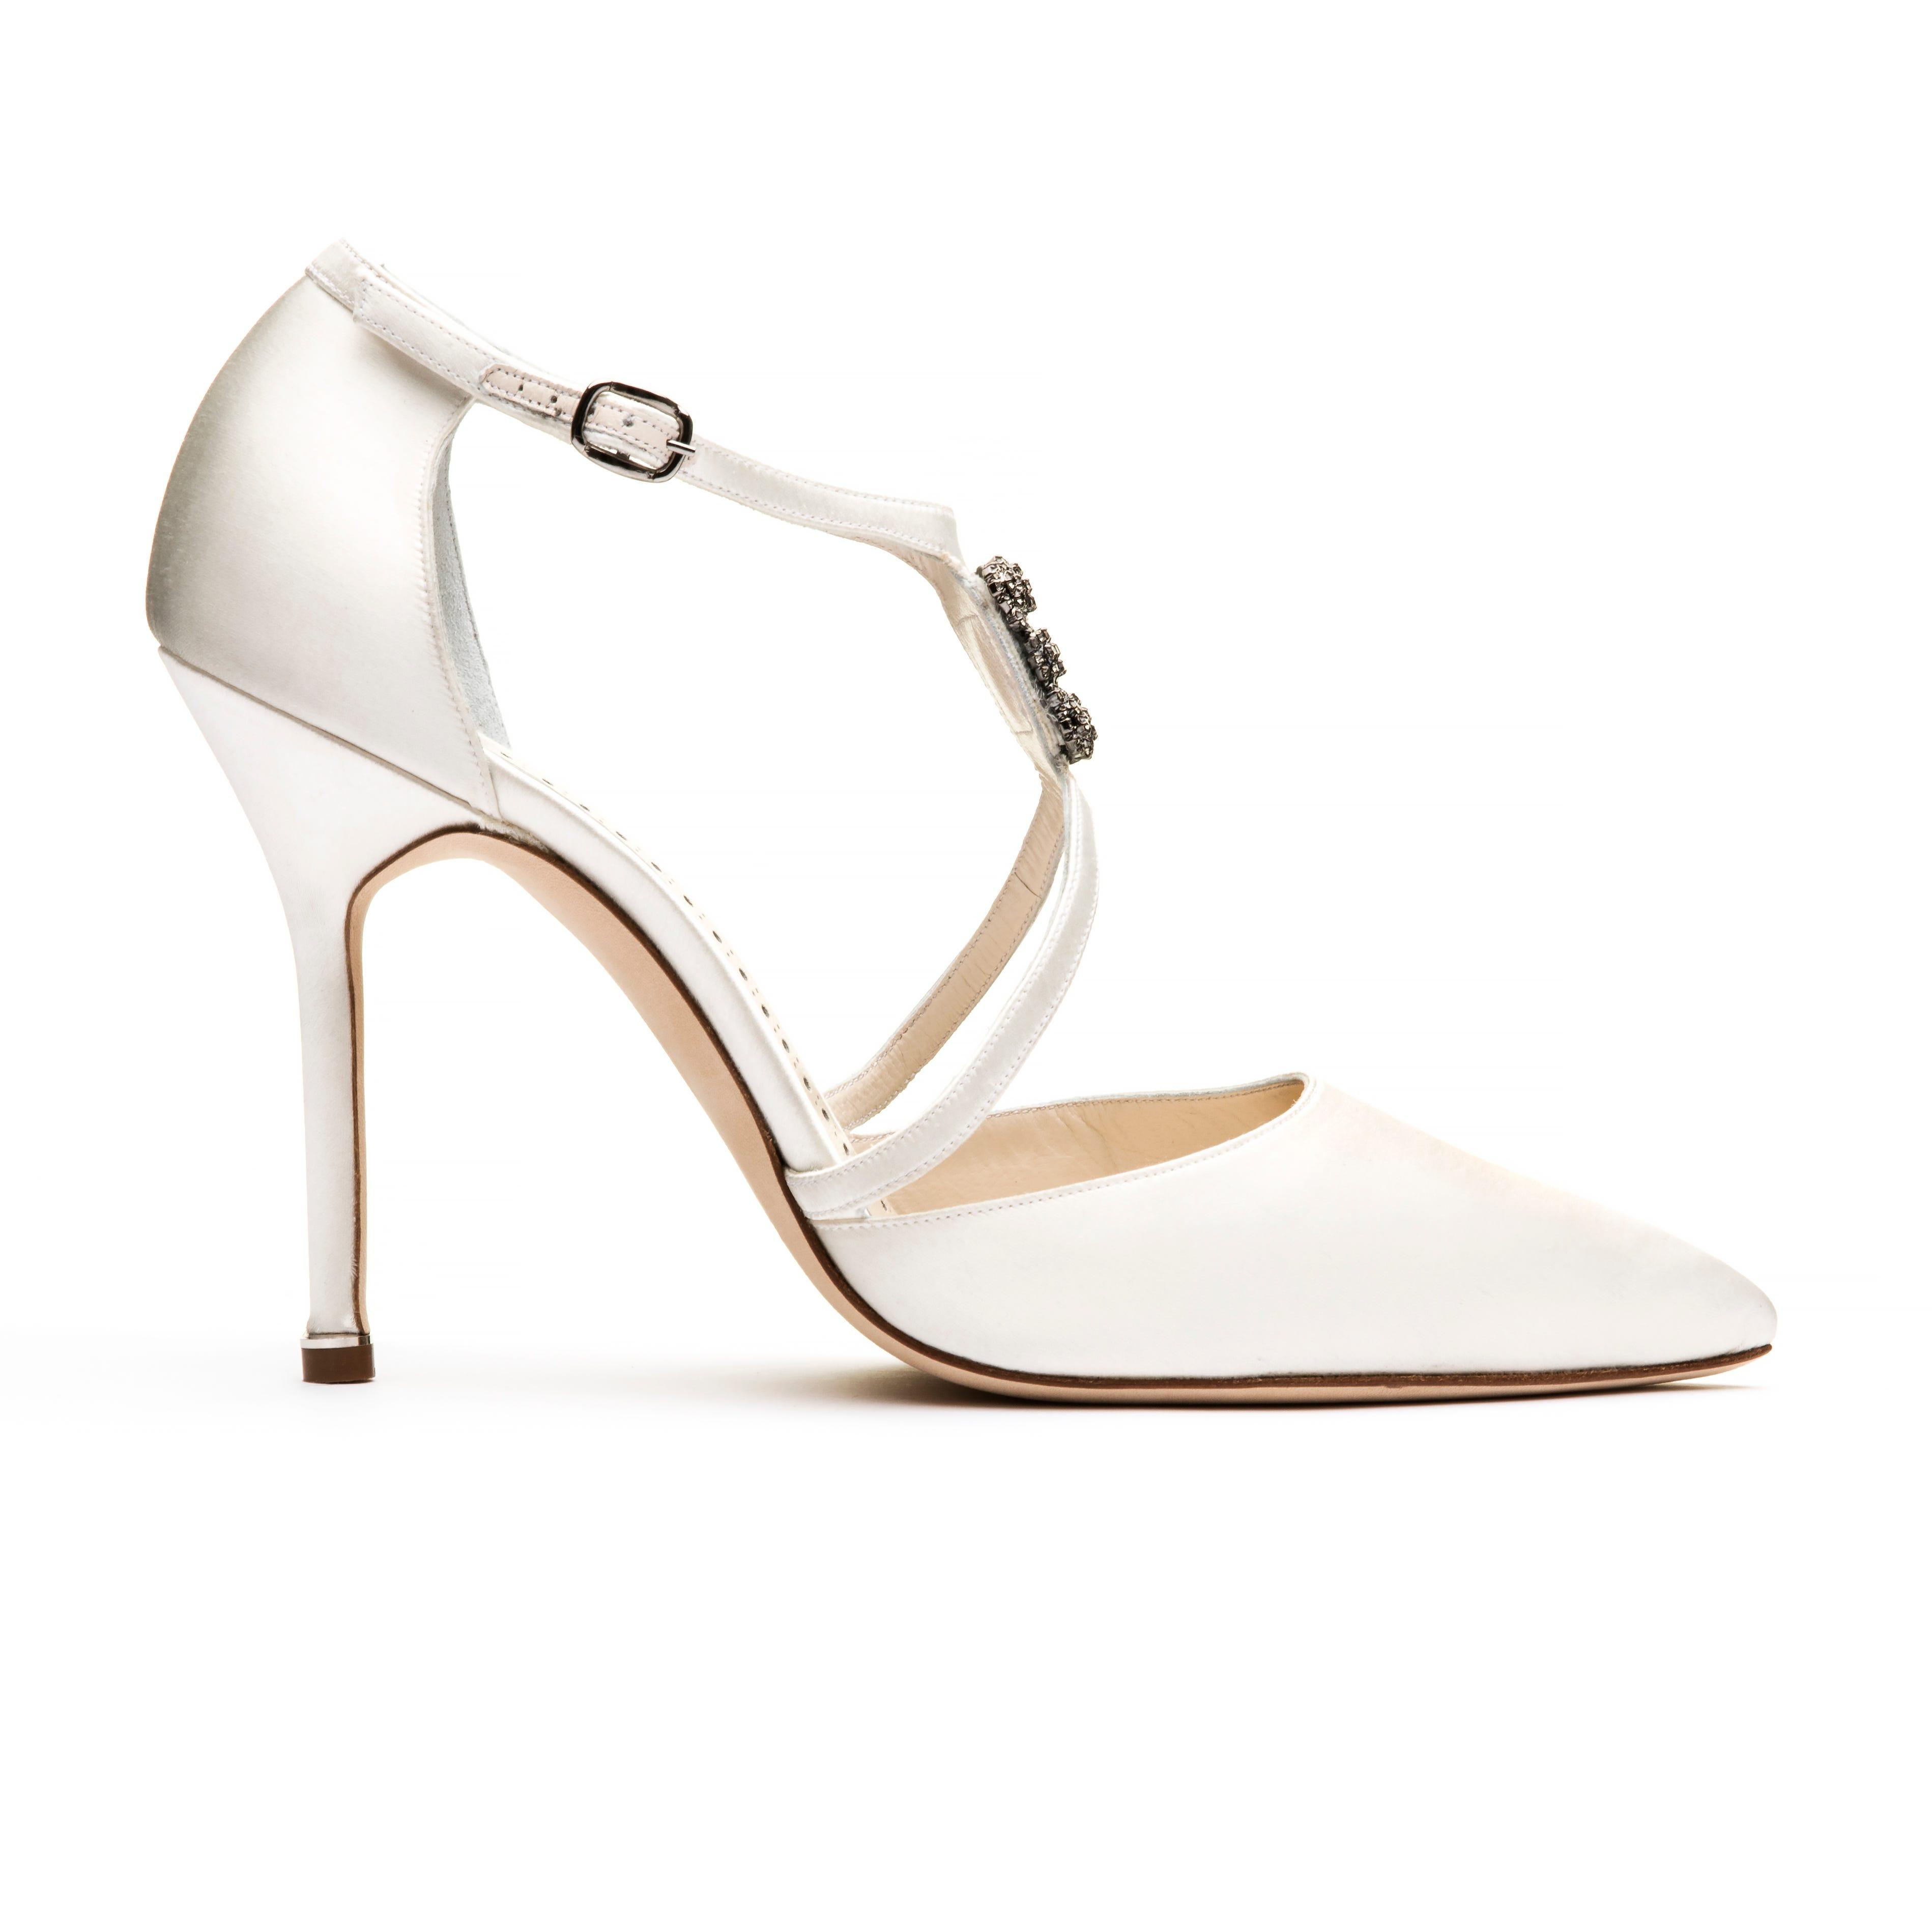 Manolo blahnik bridal collection launch wedding shoes junglespirit Choice Image